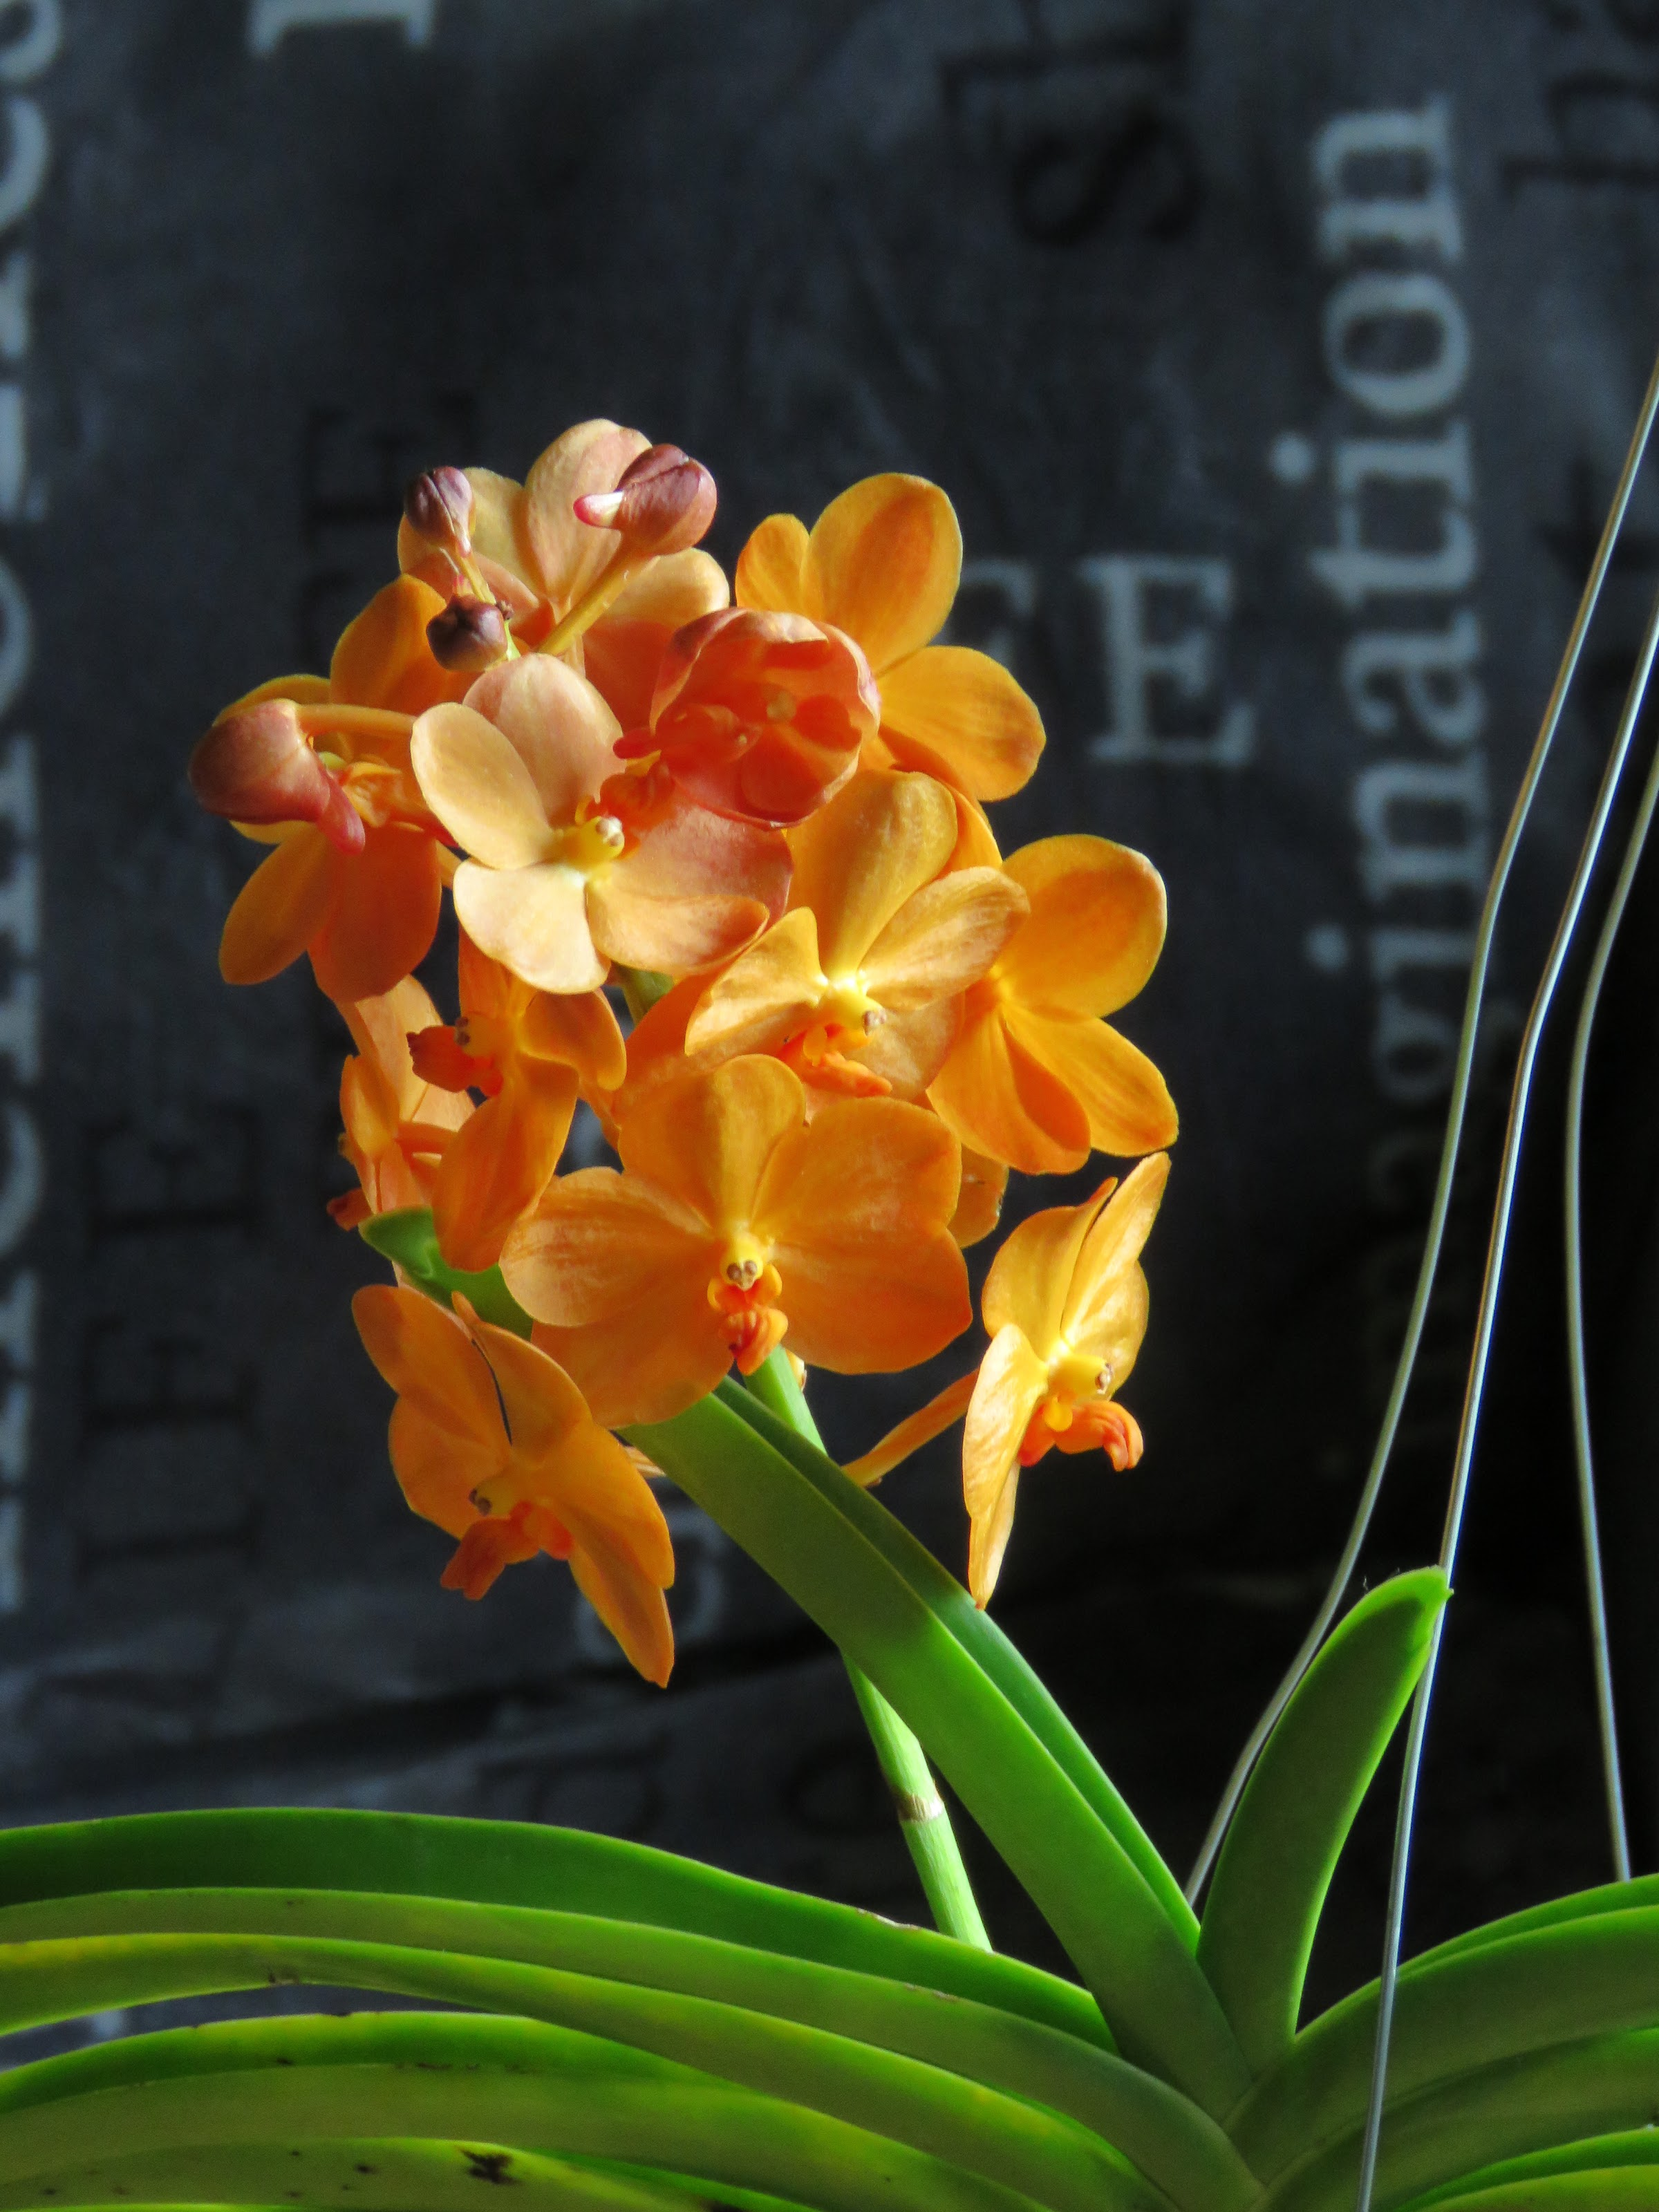 Les orchidées de Grigri - Page 8 Jcfn1Q_kvWSaDZxfHqYE2pBow1ZvpTJGaWO8SI3eioyw2as1sjsvSYJ6BDEpXJLMoJ85khBbnu6XdCWl4PytYw-QwrOgIbJLVptEX8pvTxUDU4ZyL_6vuB8i08YOKpt09EcI_BcRlso=w2400